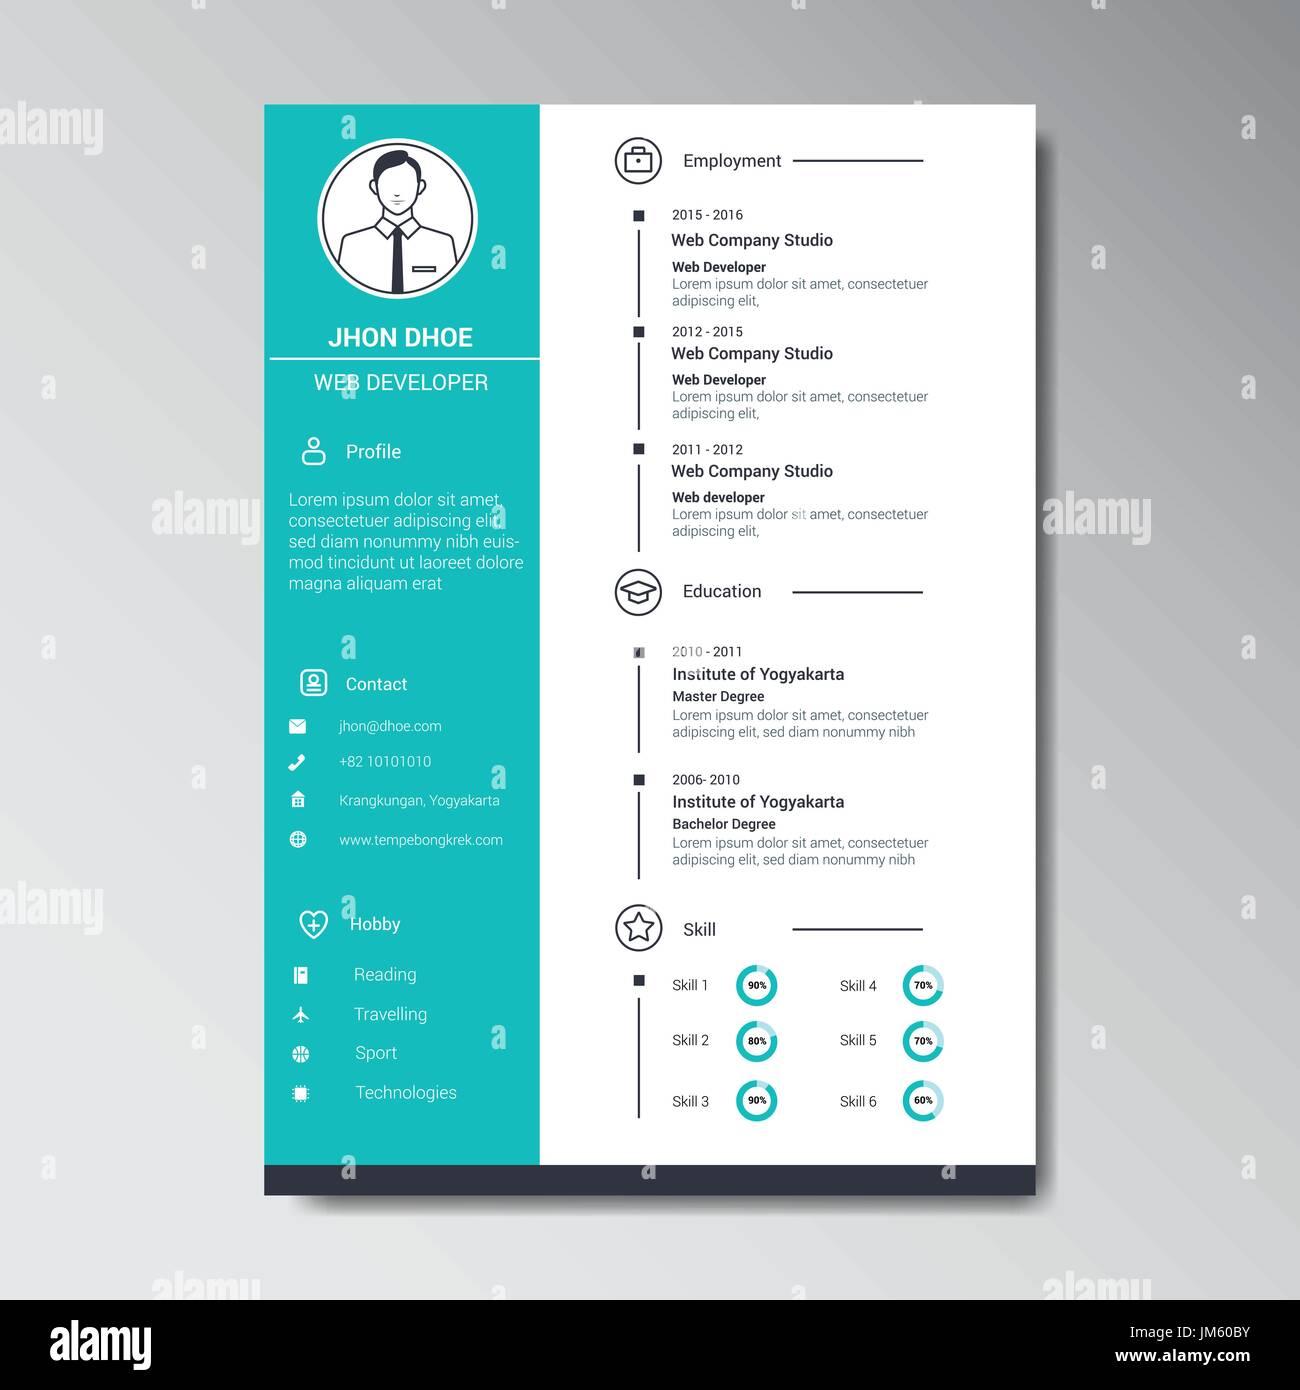 Resume Cv Curriculum Vitae Template Stockfotos & Resume Cv ...